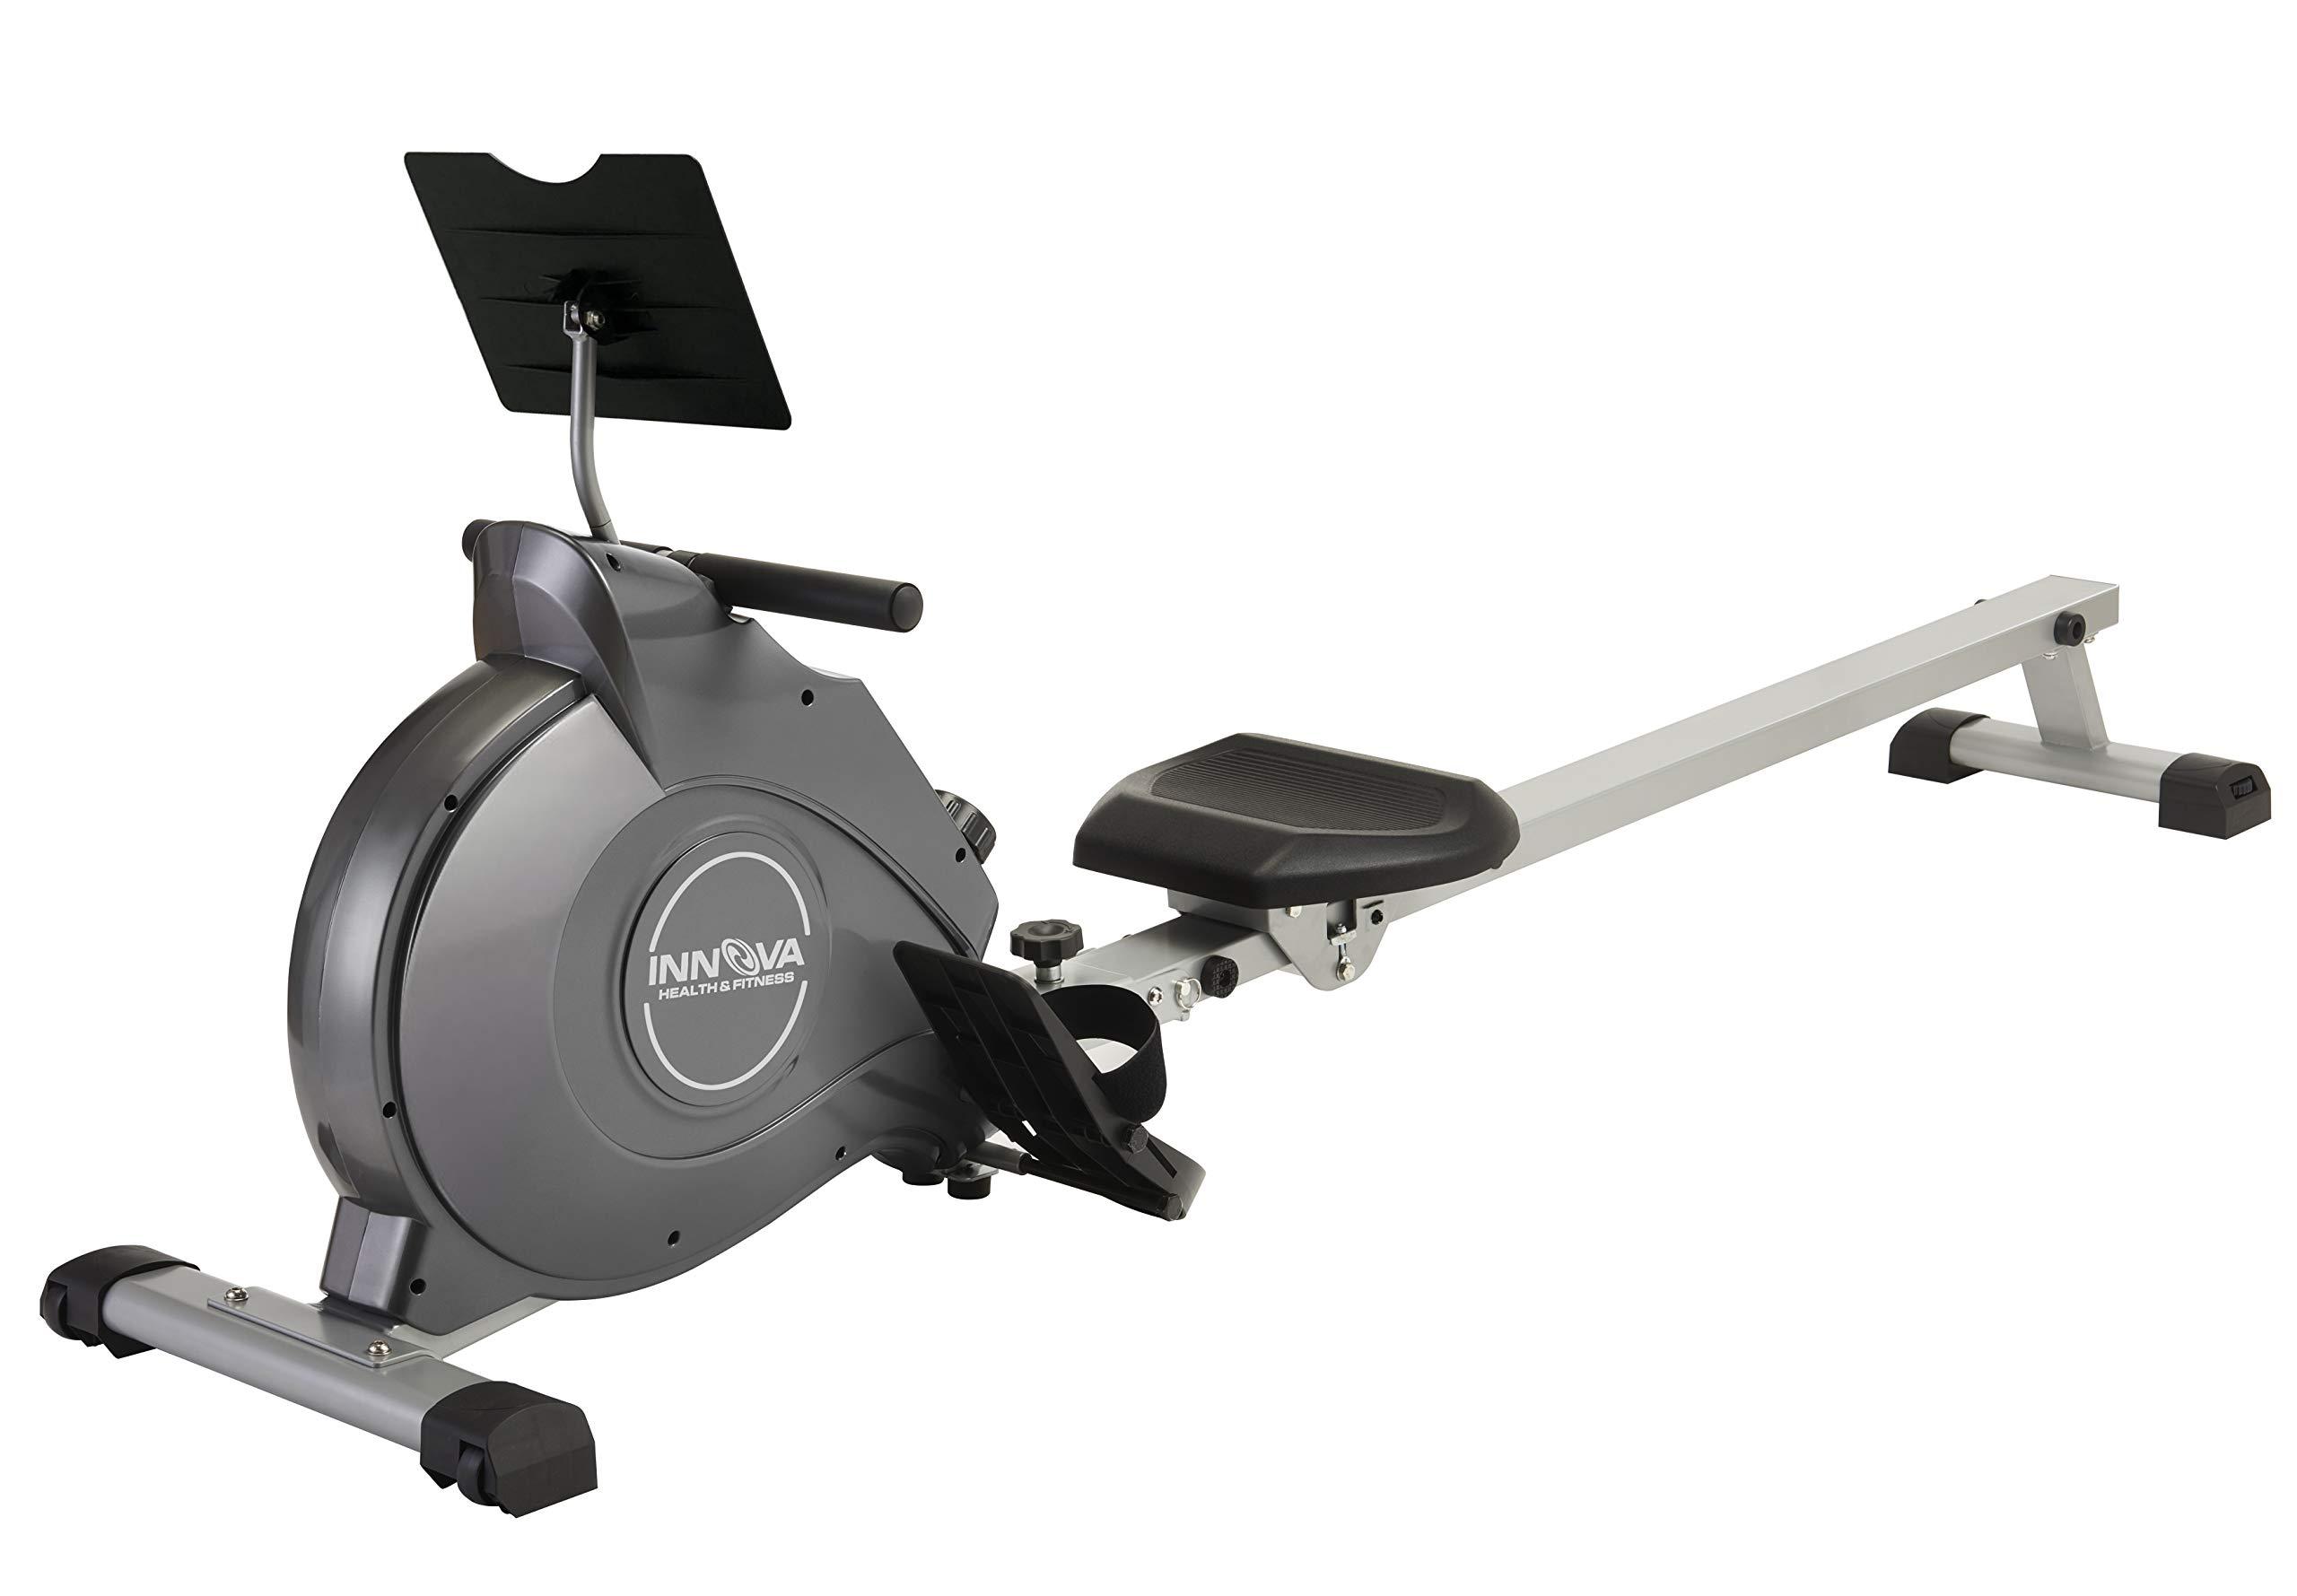 Innova IRM2000 Rowing Machine